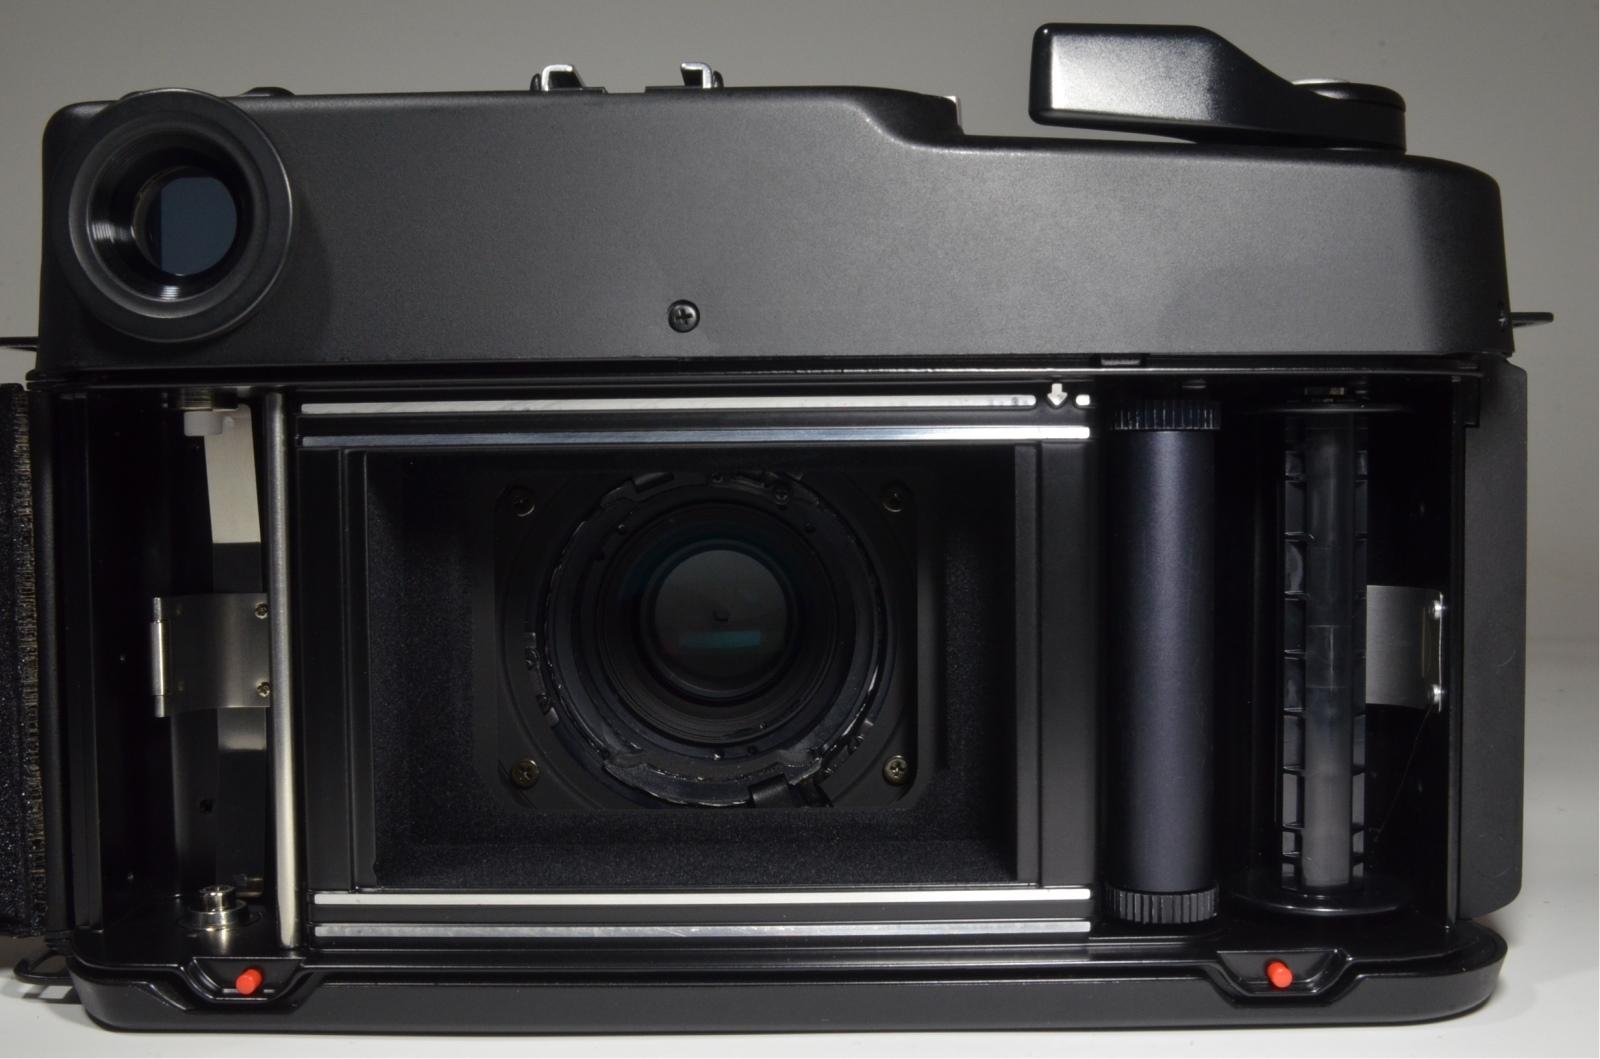 fujifilm gw690iii professional ebc 90mm f3.5 with flash sunpak auto 3075g